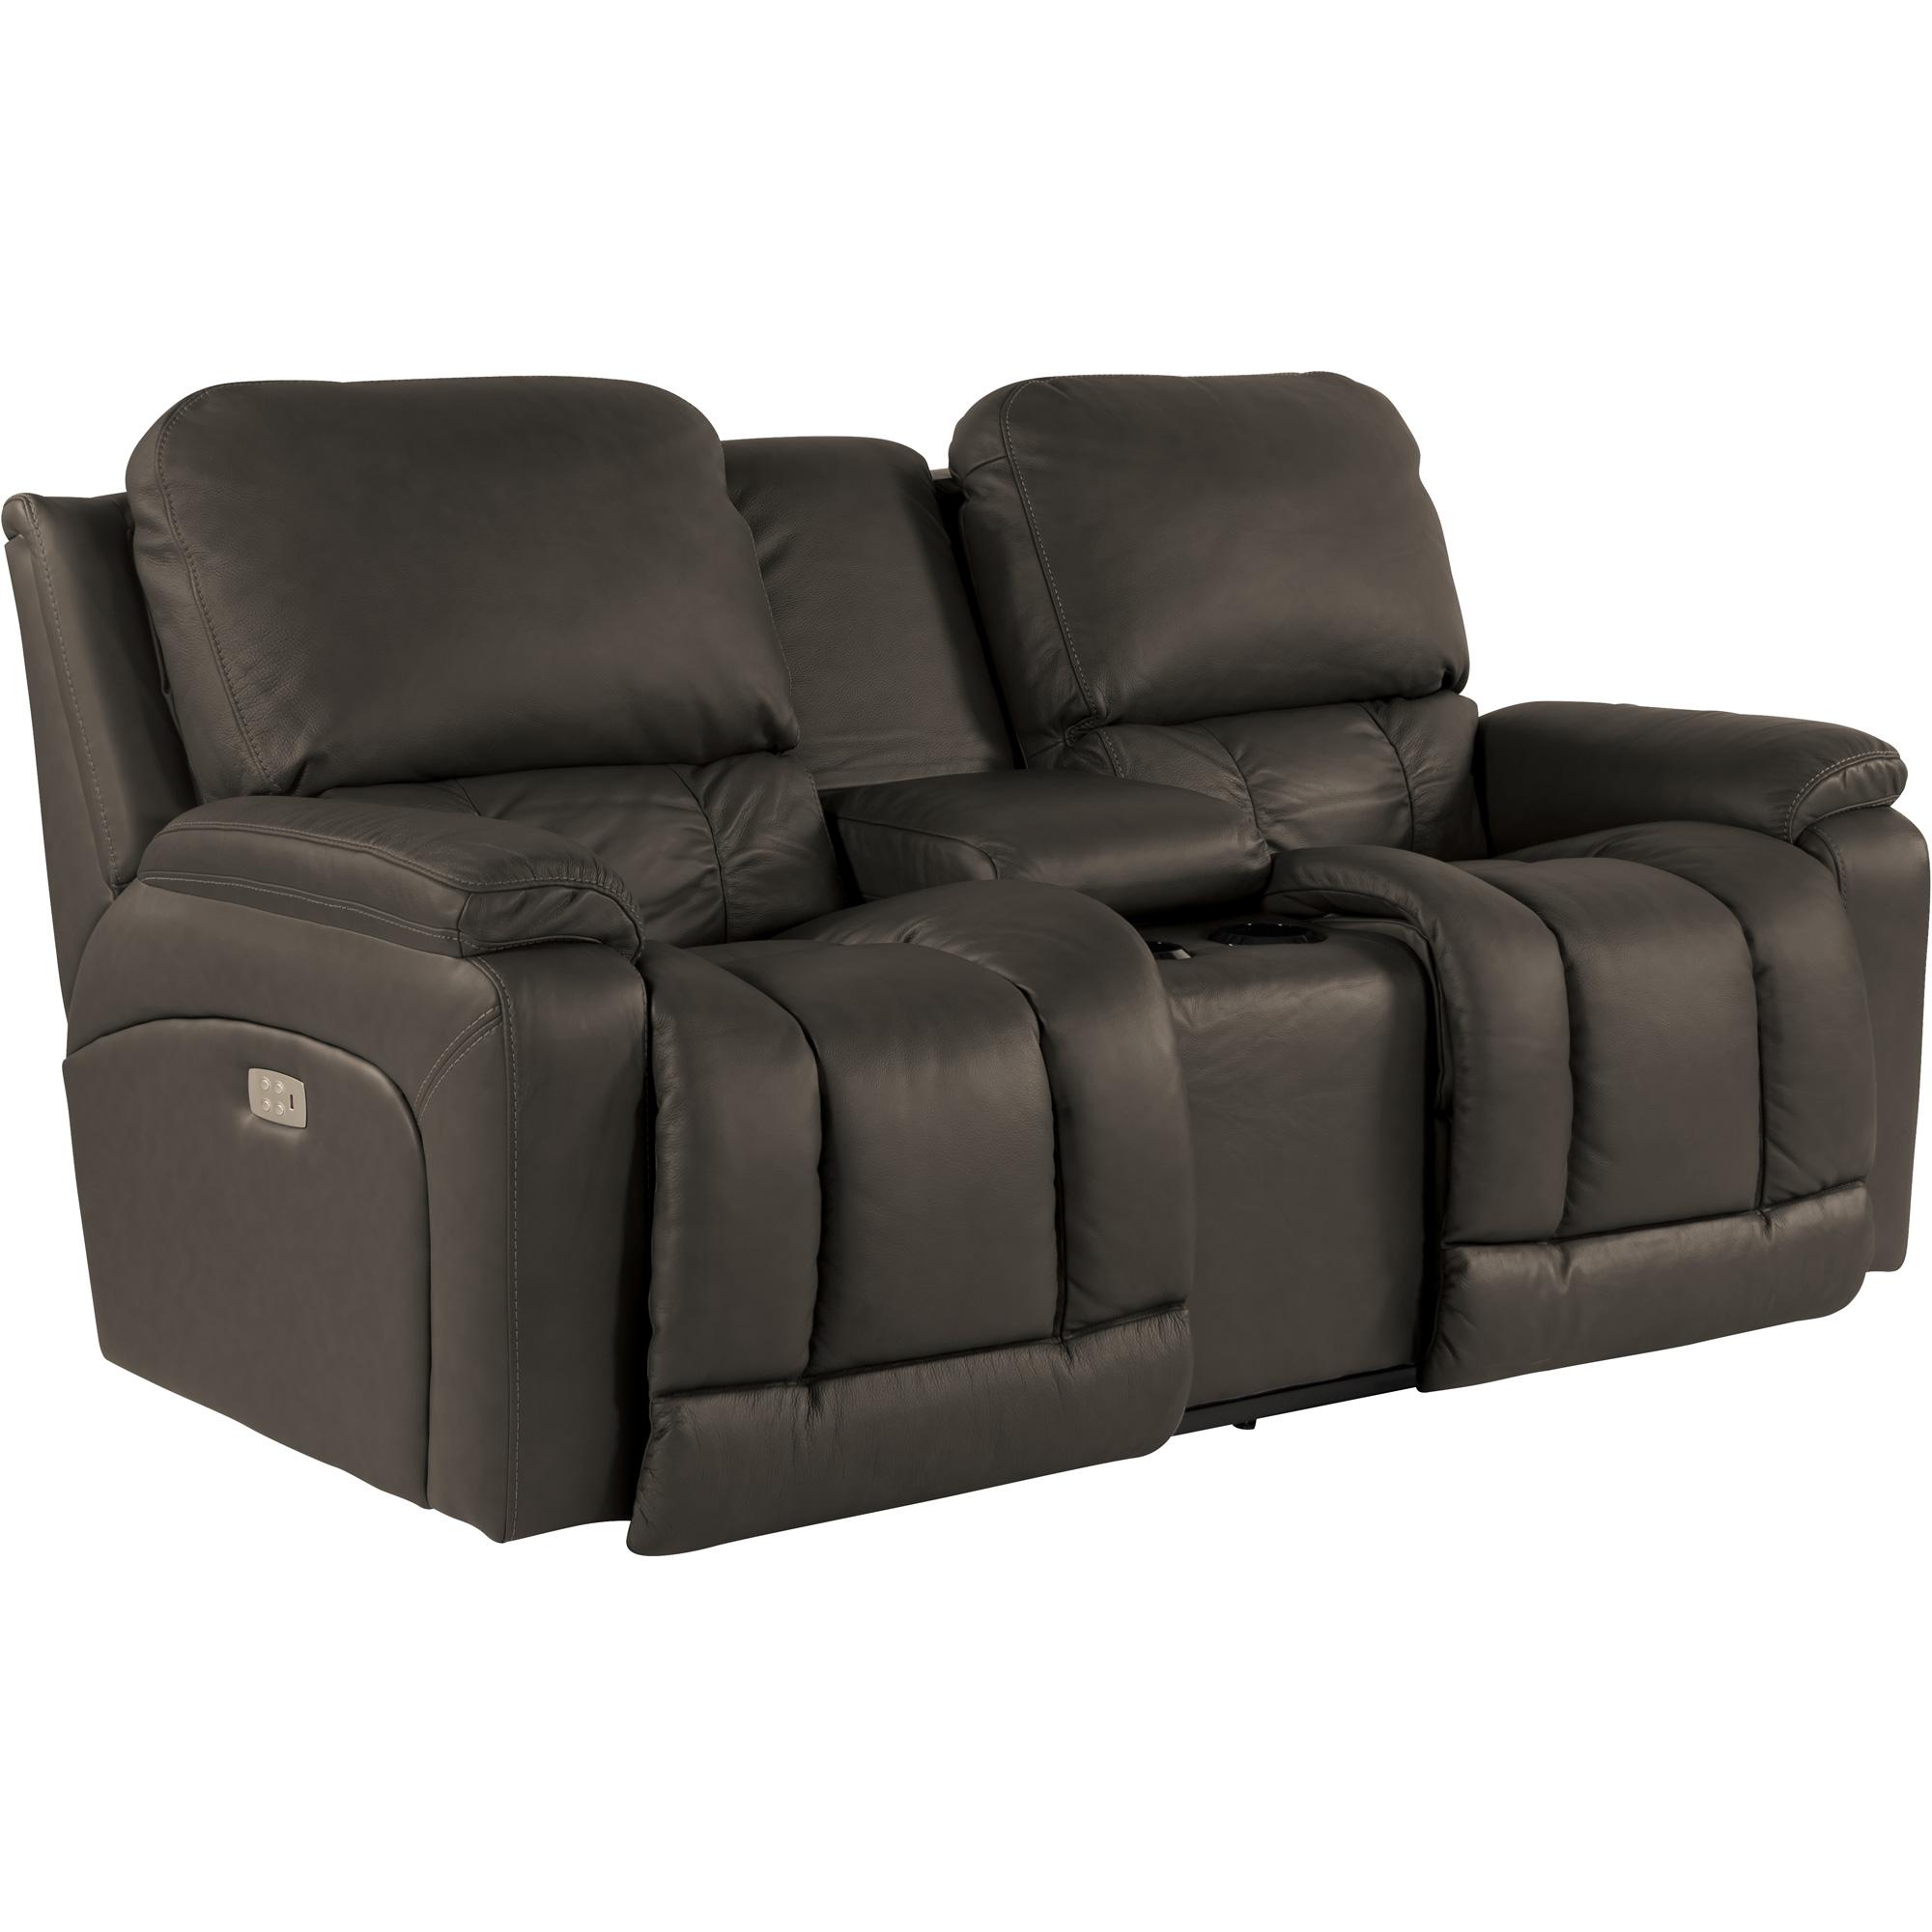 Prime Greyson Chocolate Power Plus Reclining Console Loveseat Machost Co Dining Chair Design Ideas Machostcouk